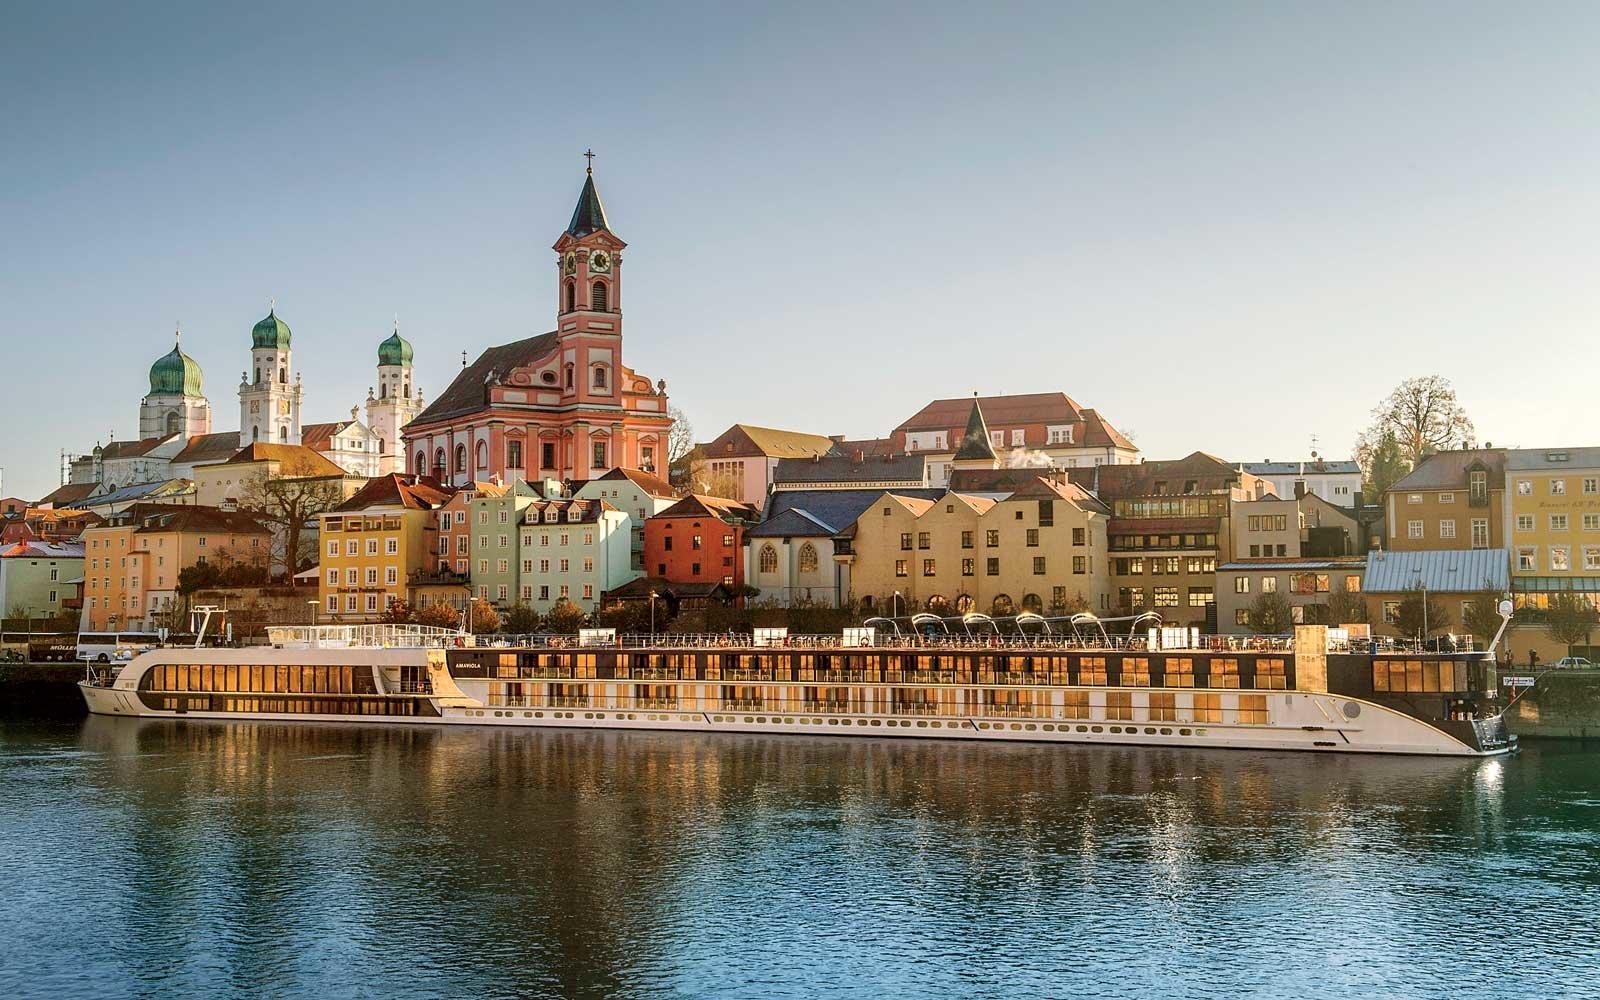 adventures-by-disney-europe-danube-river-cruise-itinerary-video-amaviola-cruising-down-the-danube-river.jpg